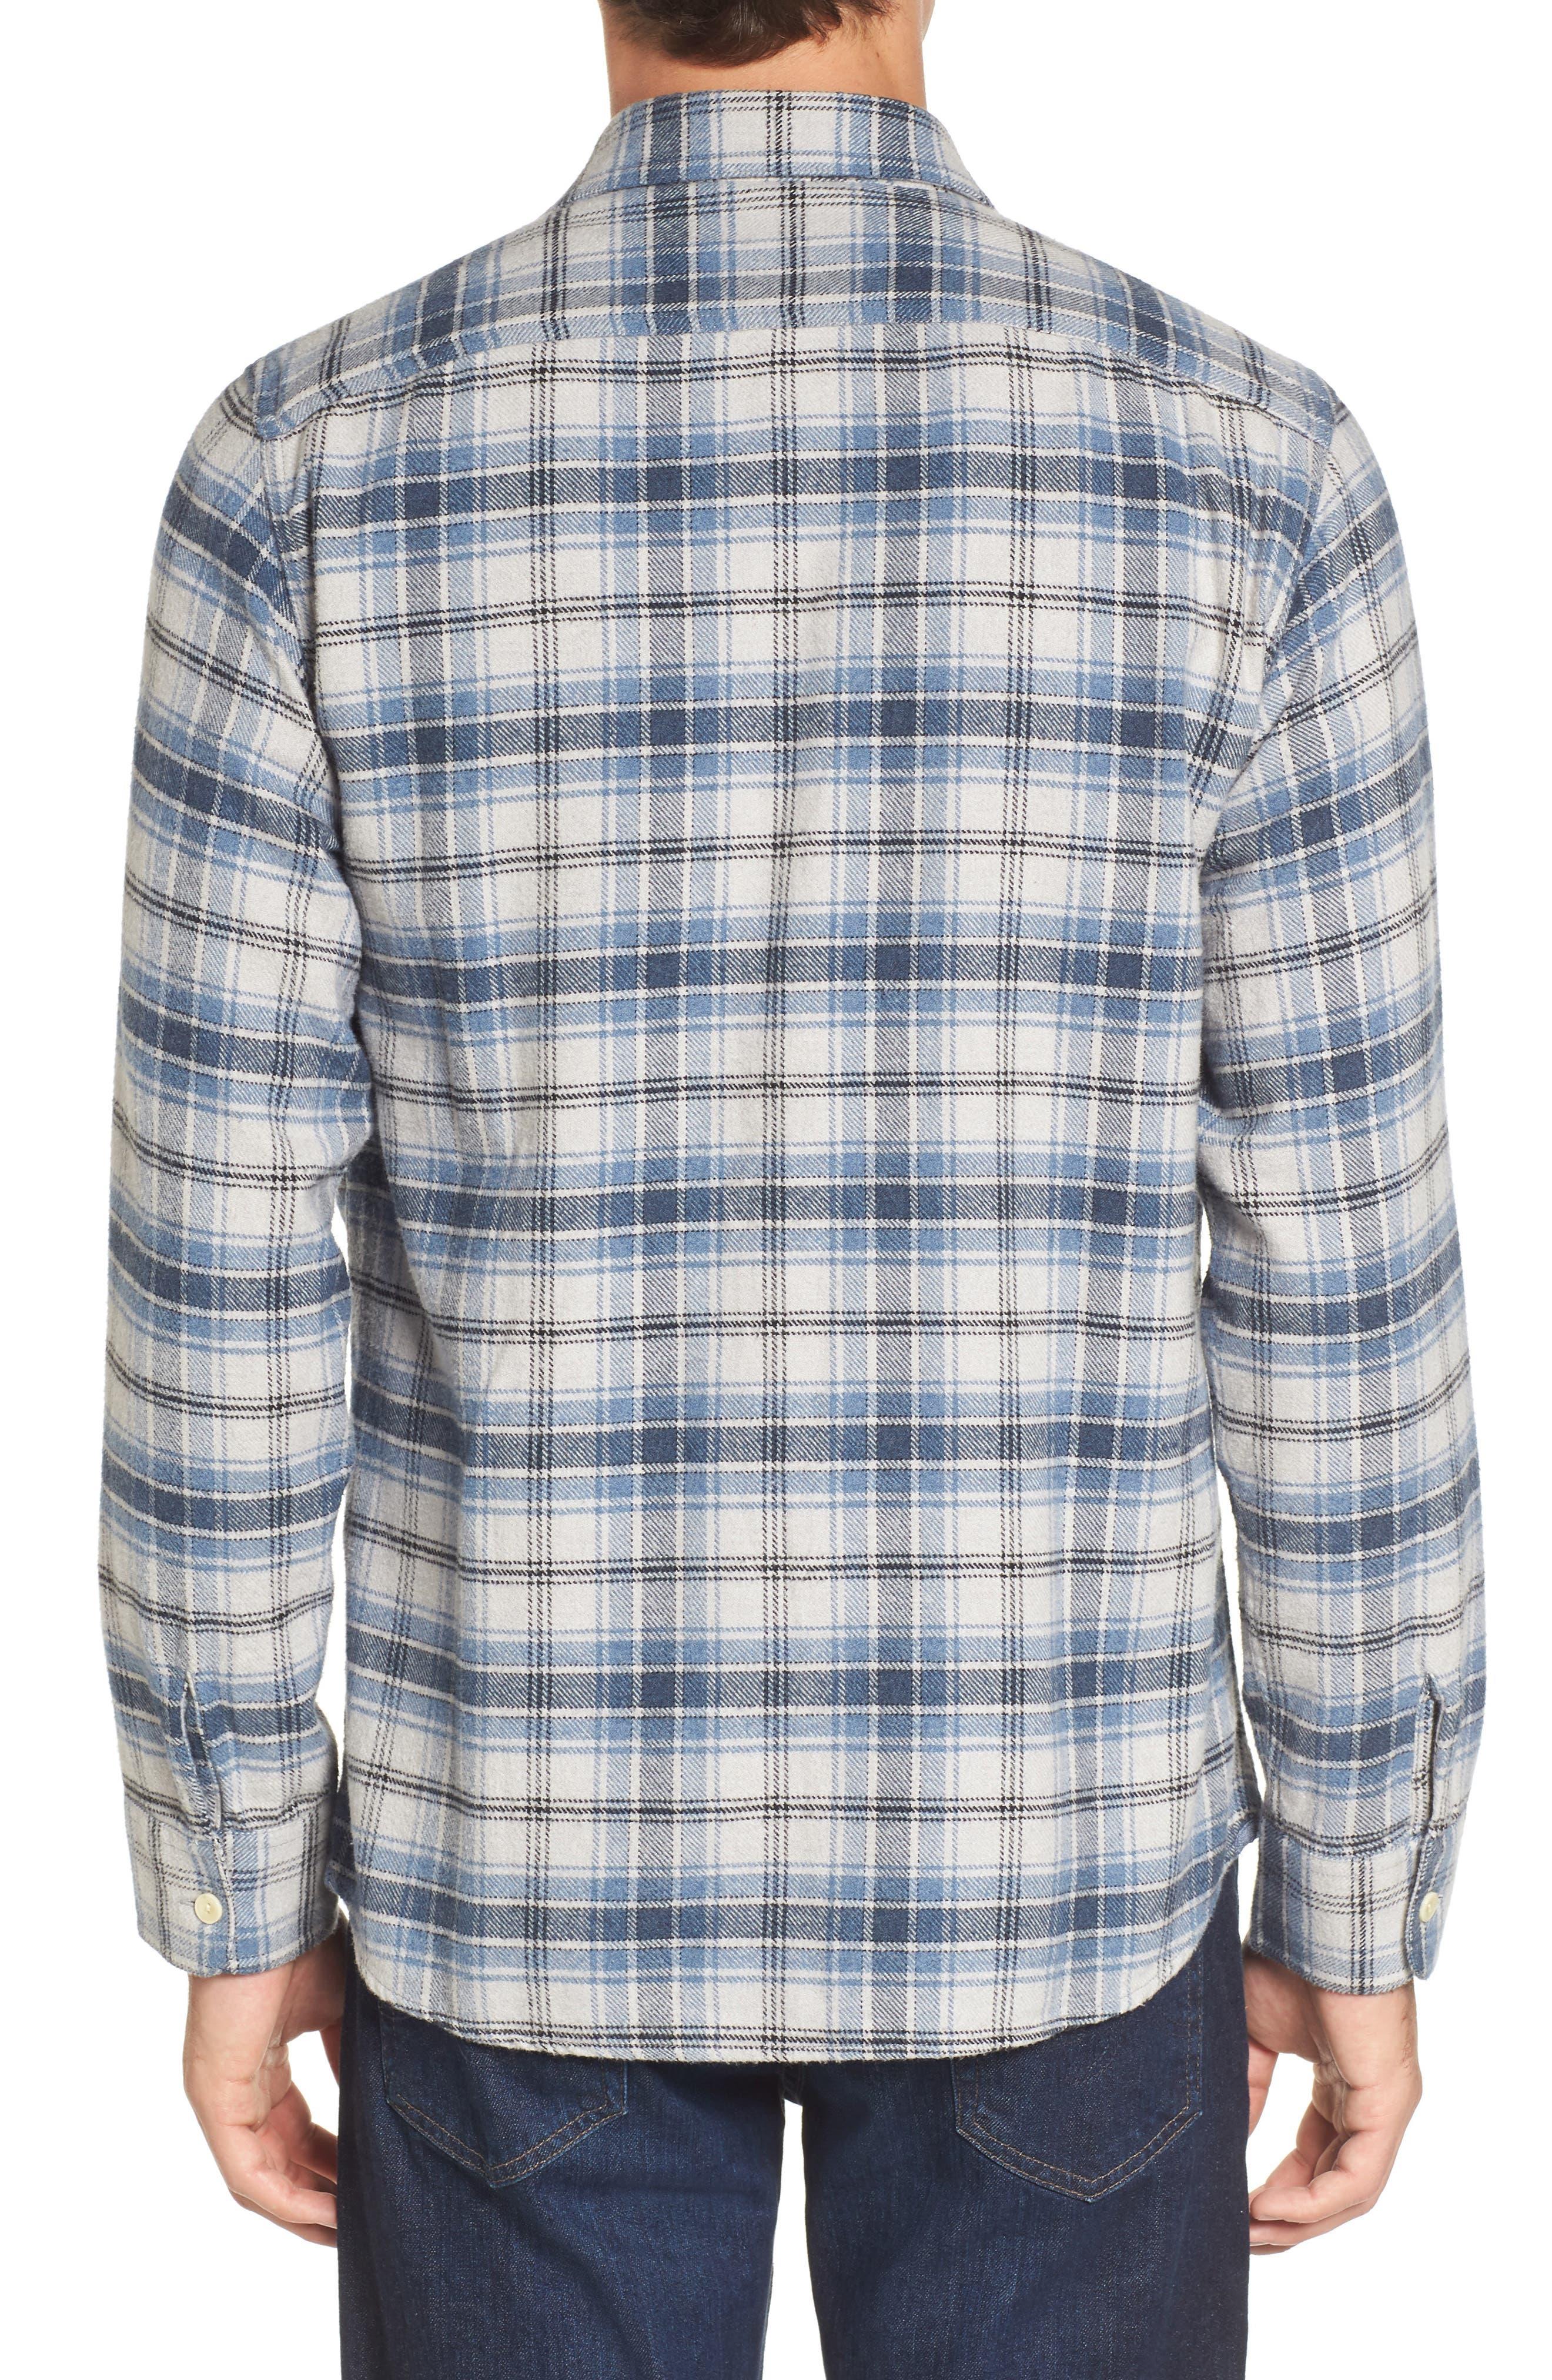 Campton Heritage Plaid Flannel Shirt,                             Alternate thumbnail 2, color,                             464